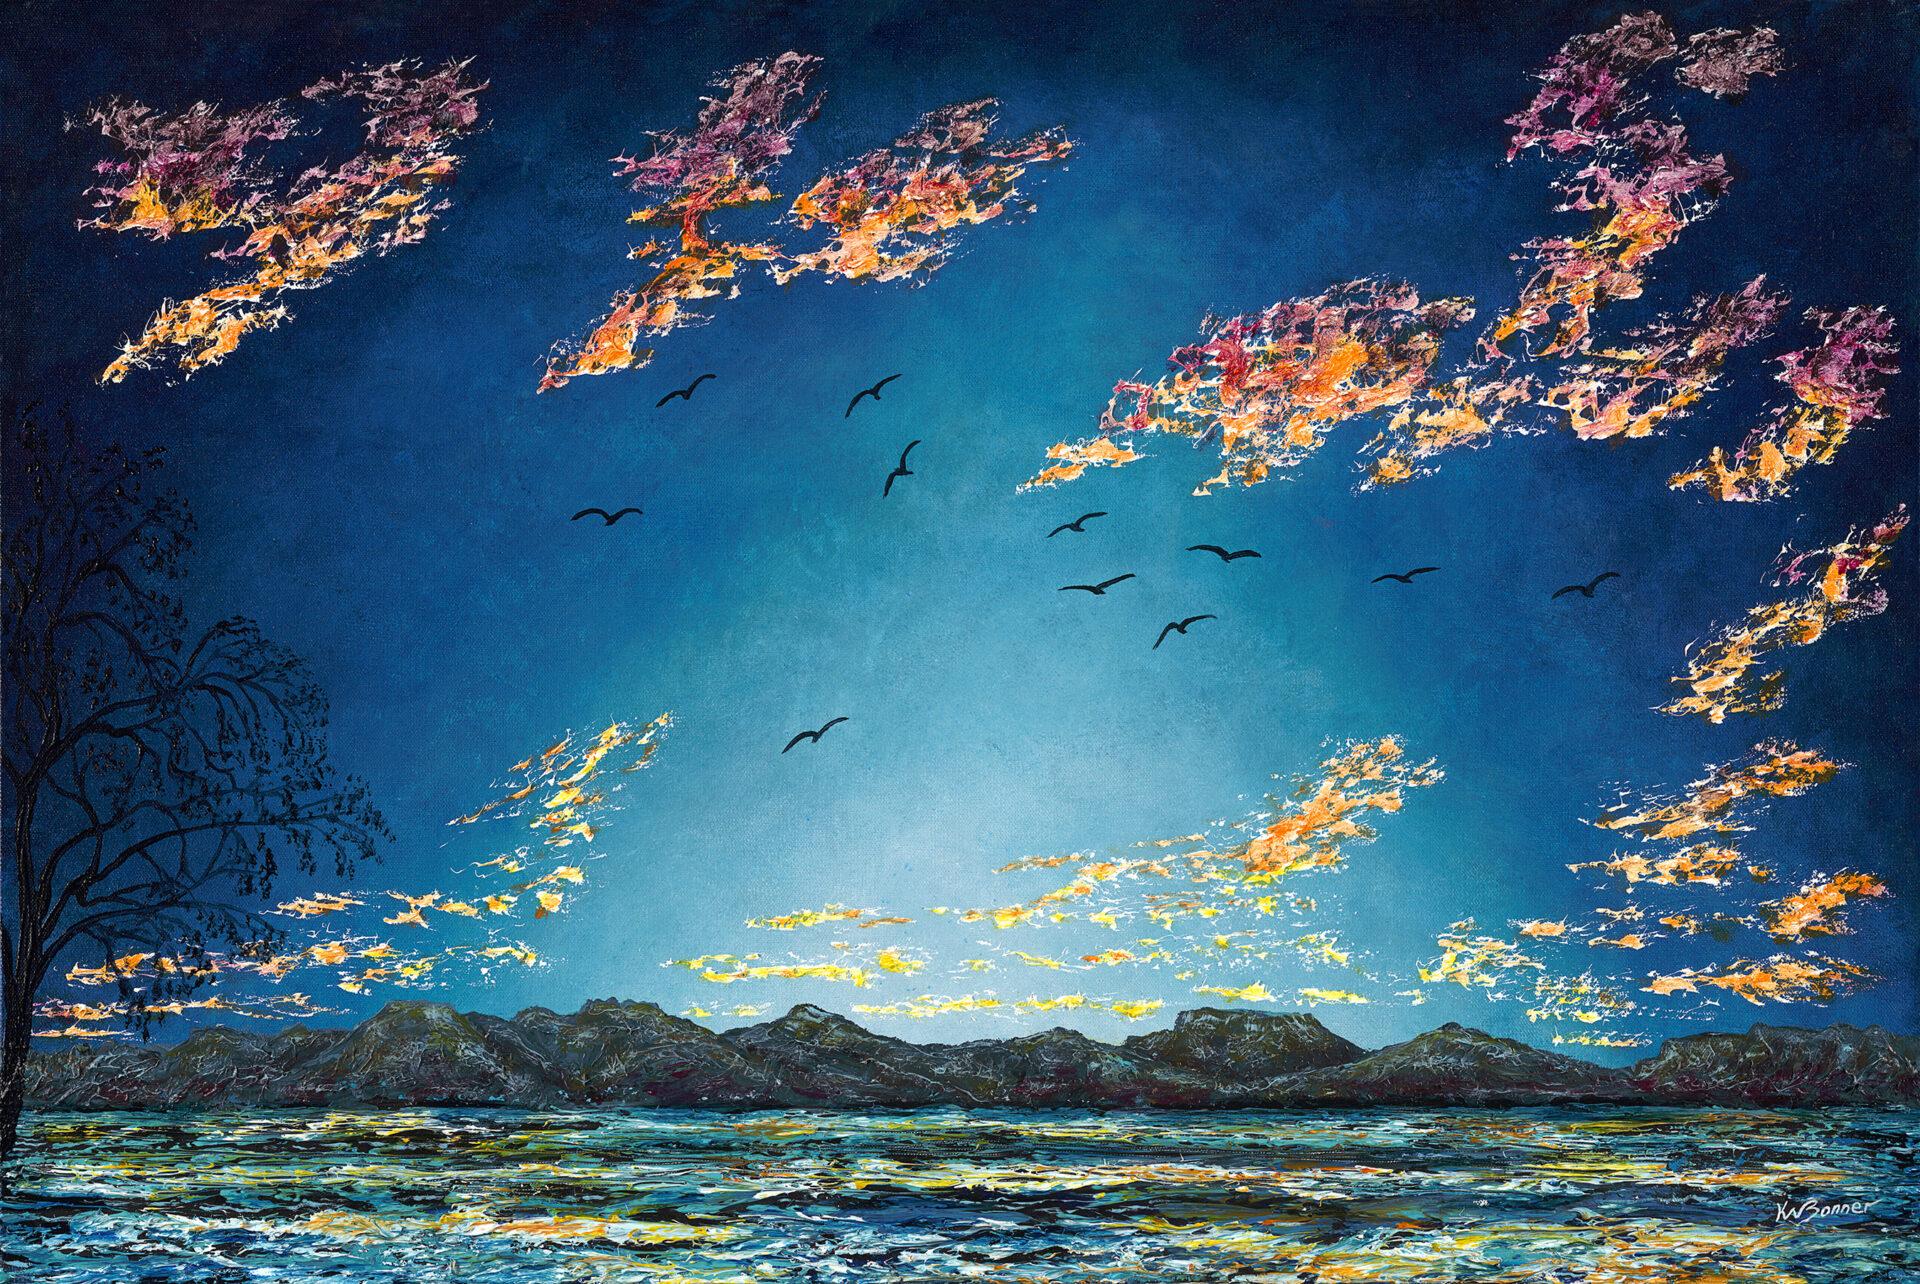 Leave the light on|Seascape|landscape|Ken Bonner original oil painting|Santa Fe NM